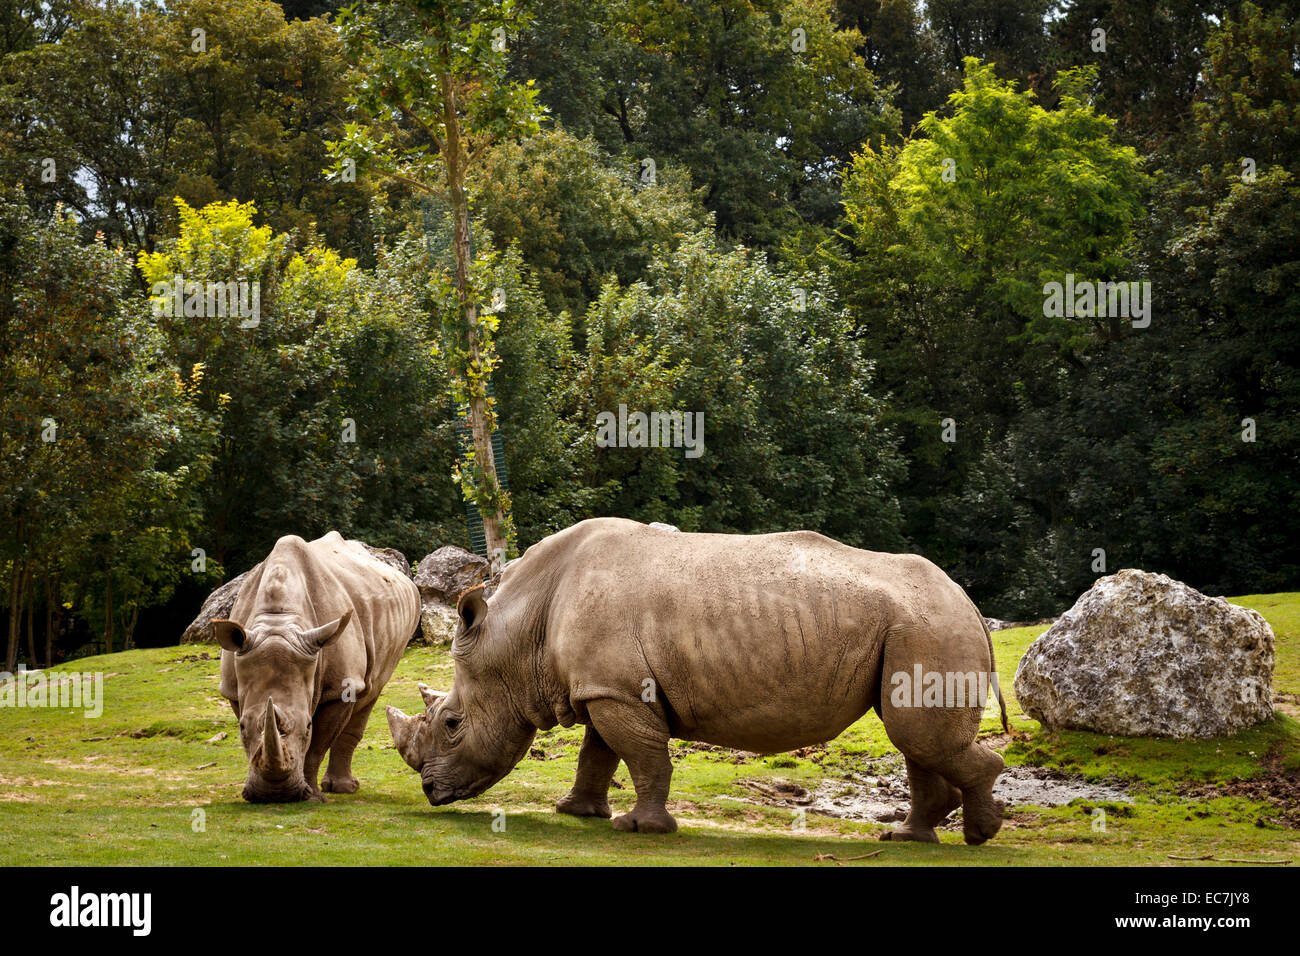 Le zoo parc de Beauval, rhinocéros blanc, France. Photo Stock